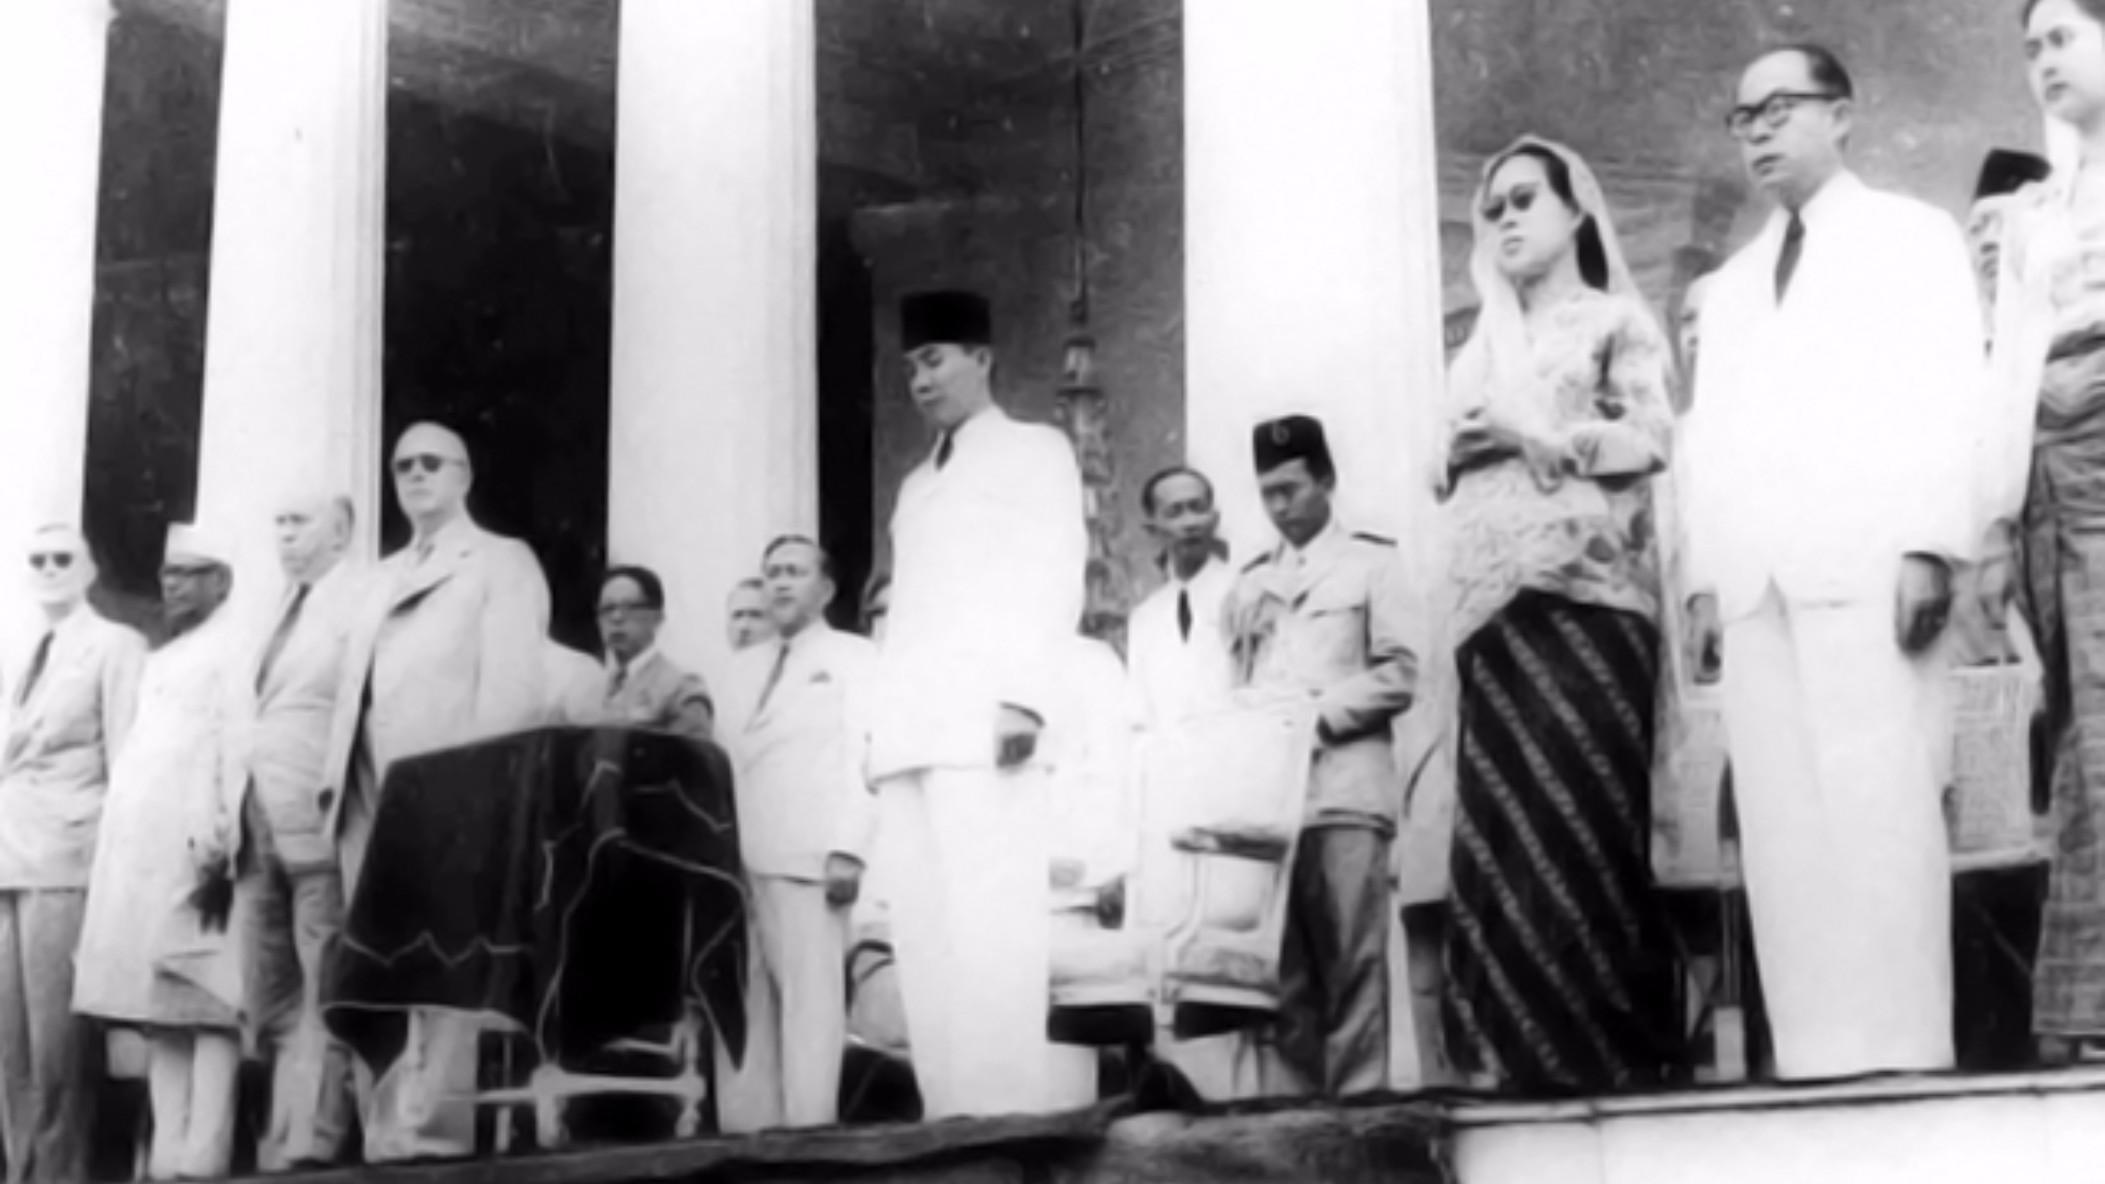 Sejarah Kemerdekaan Indonesia 17 Agustus 1945 - Kalimat ID